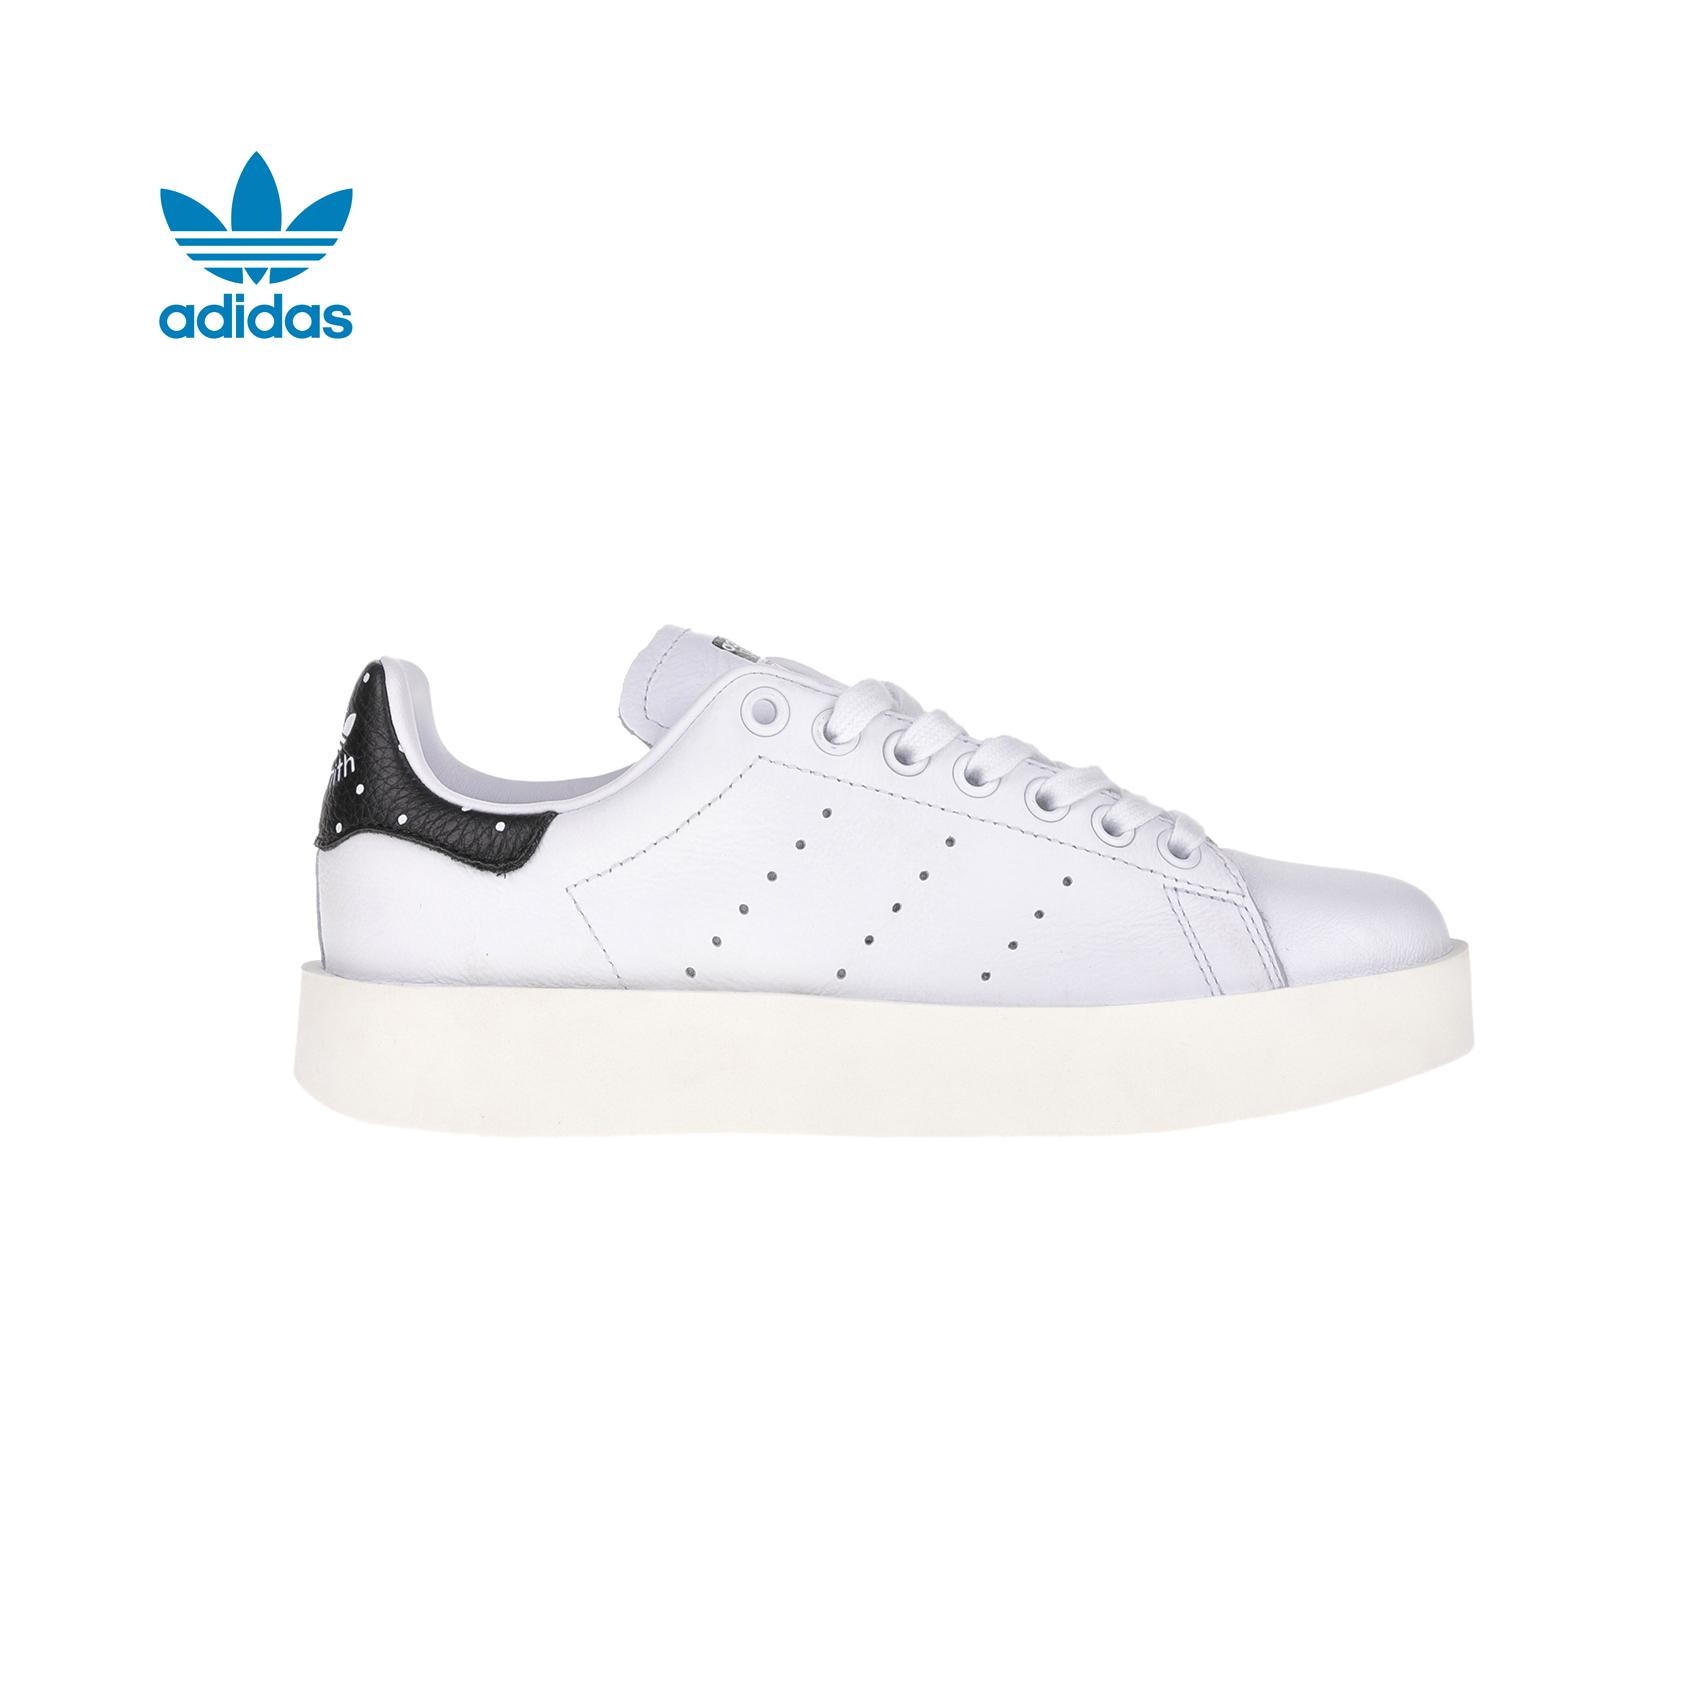 e7fc4d11cee ADIDAS – Γυναικεία sneakers STAN SMITH λευκά Γυναικεία/Παπούτσια/Sneakers ADIDAS  ORIGINALS Τα διαχρονικά